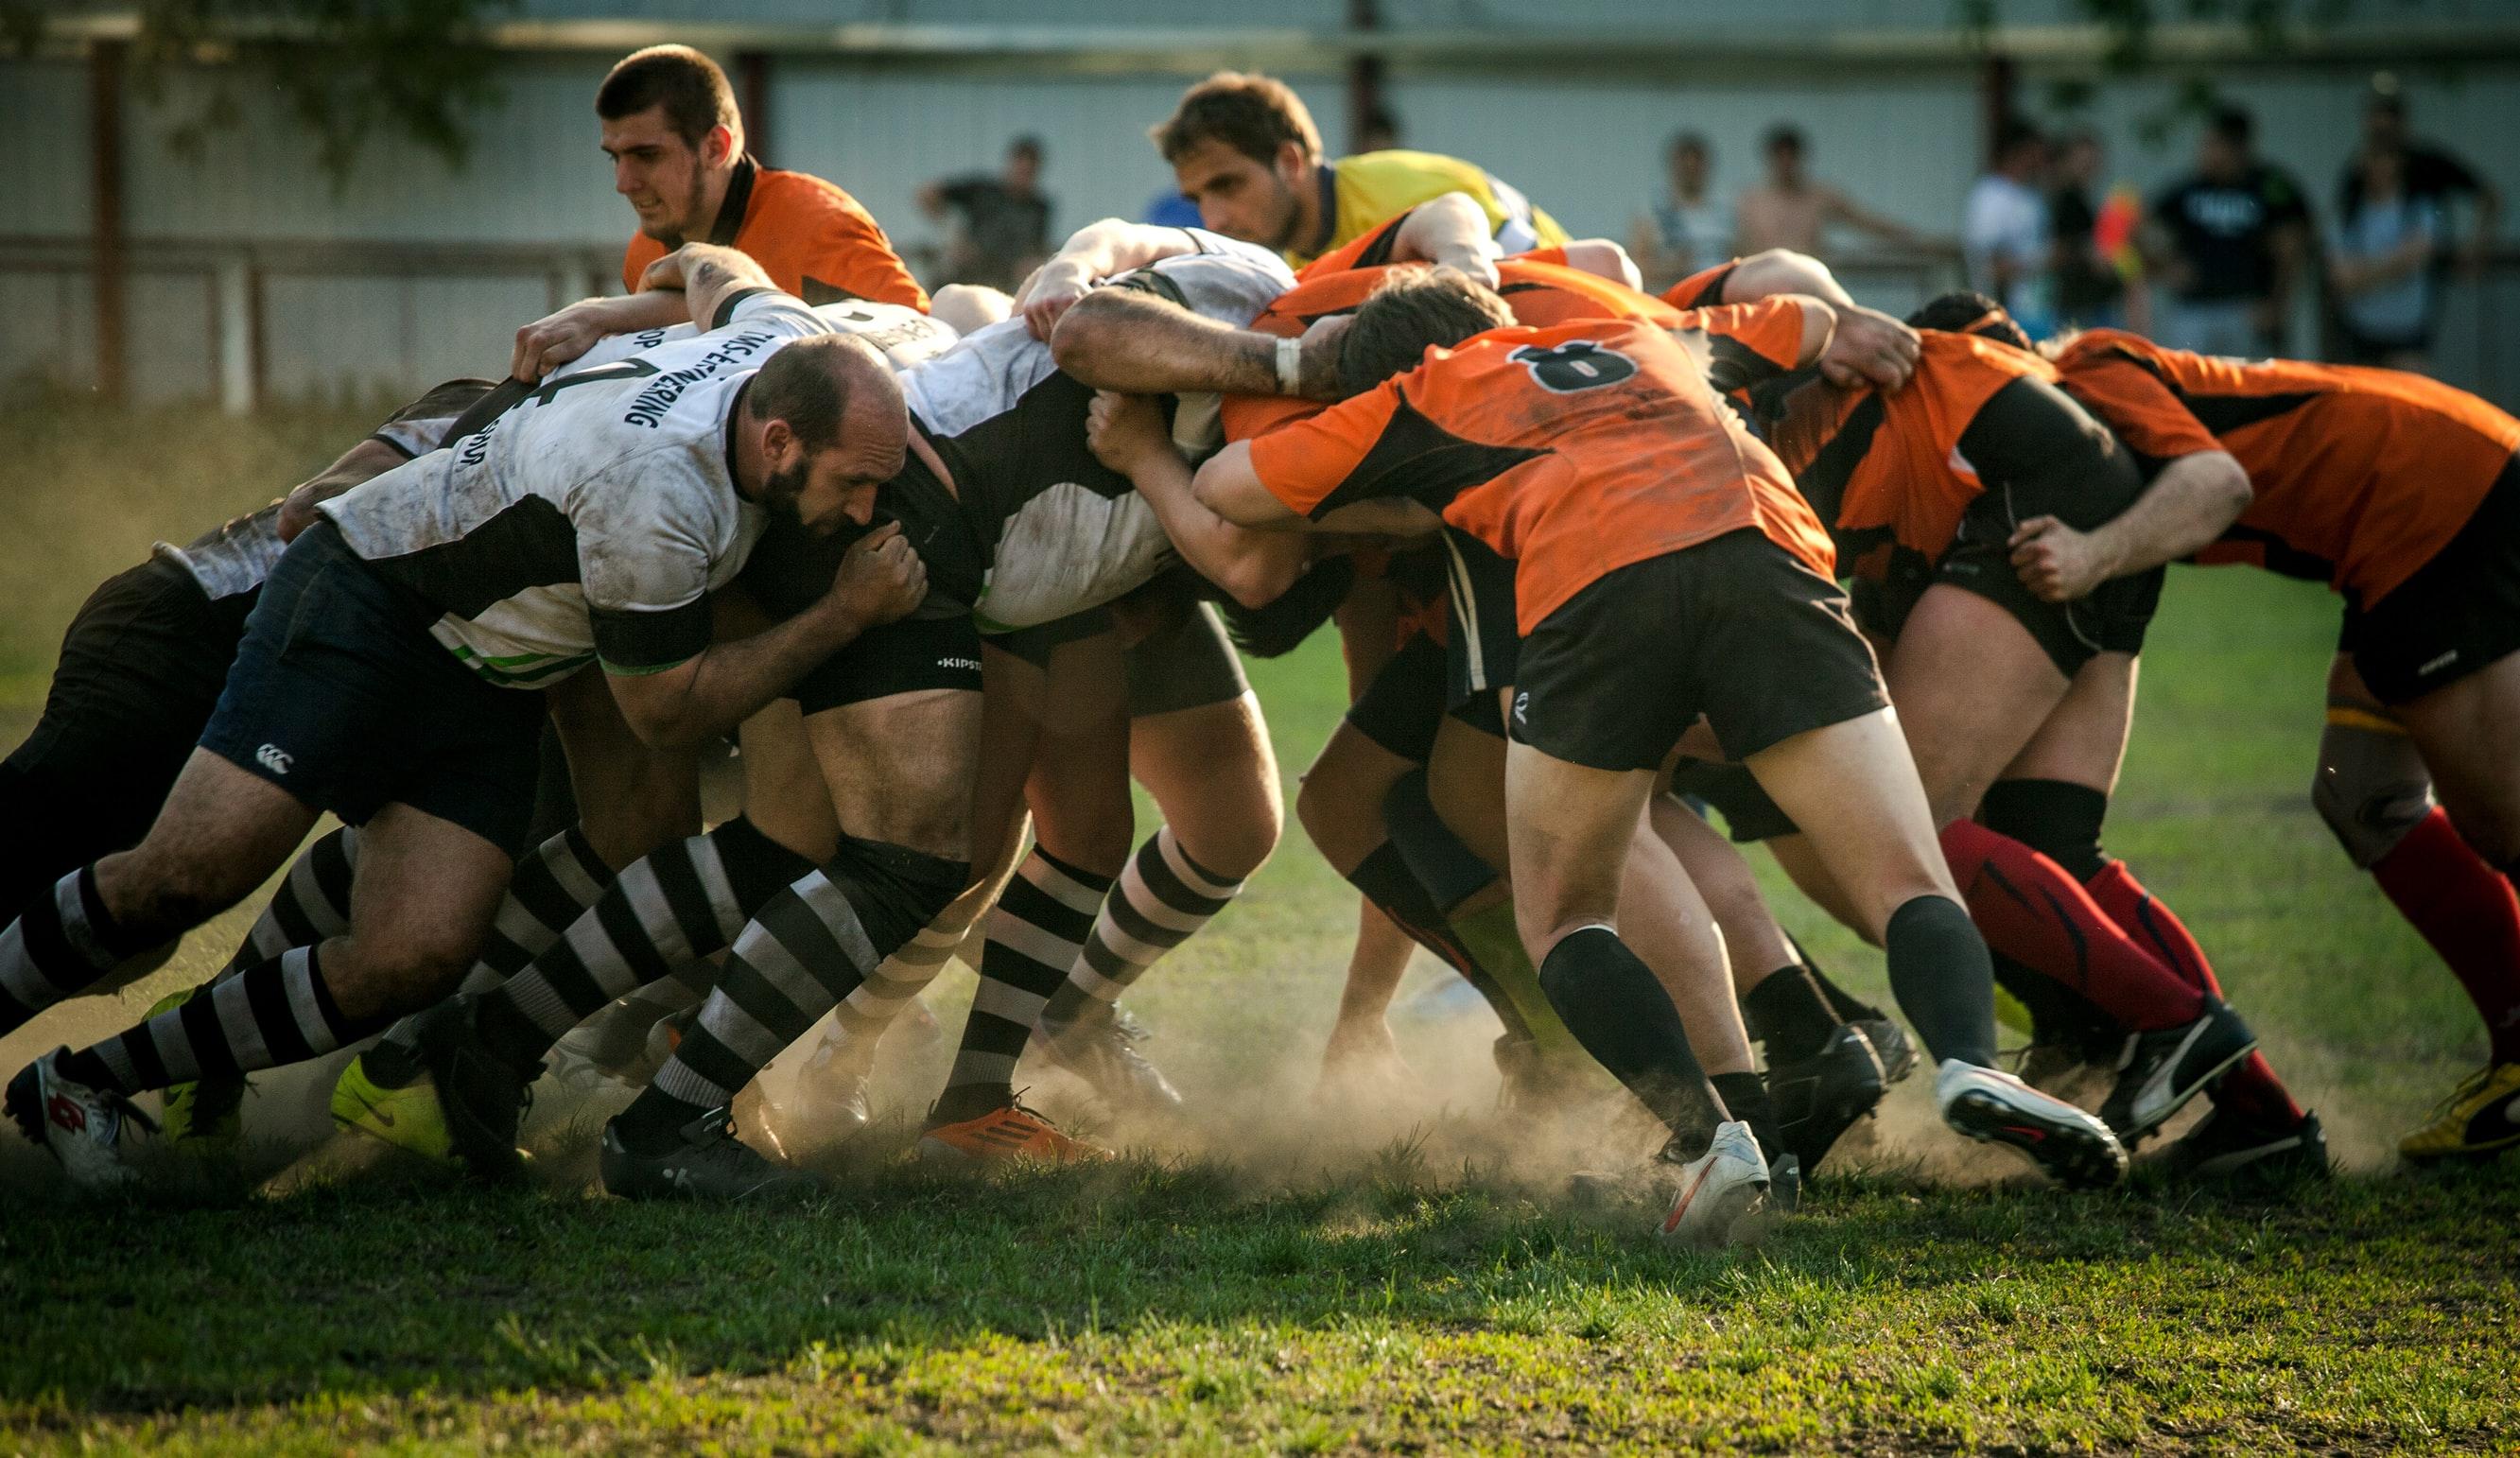 Rugbyspieler drängeln